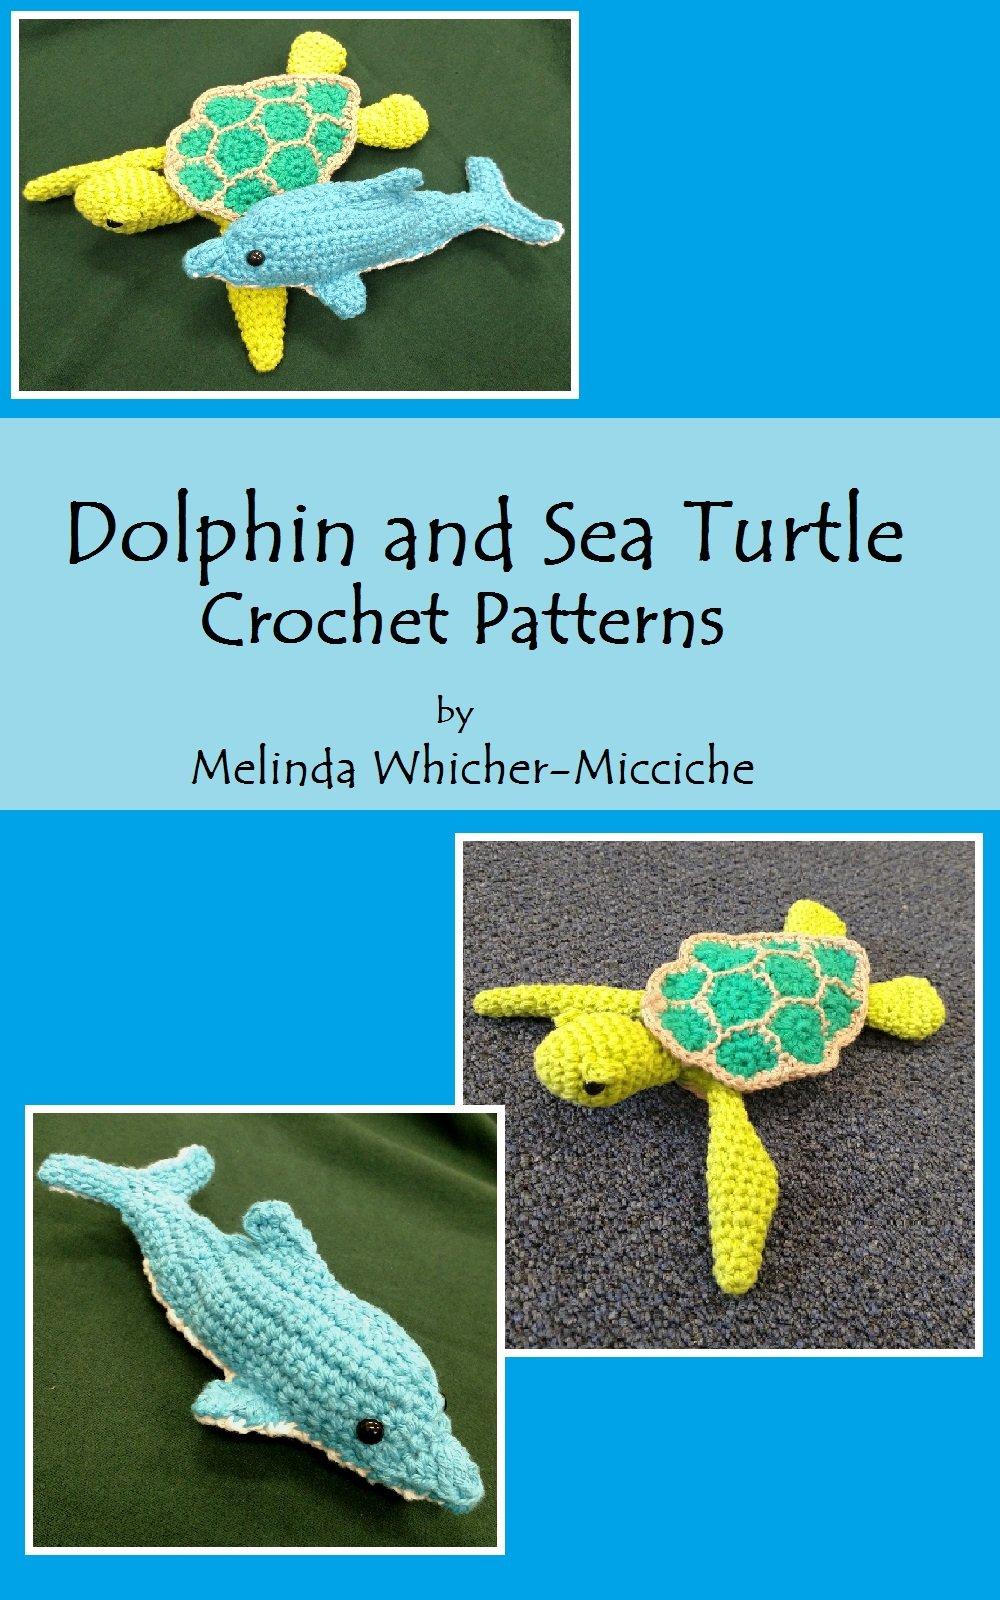 Crochet pattern: Dolphin | Flying Dutchman Crochet Design | 1600x1000